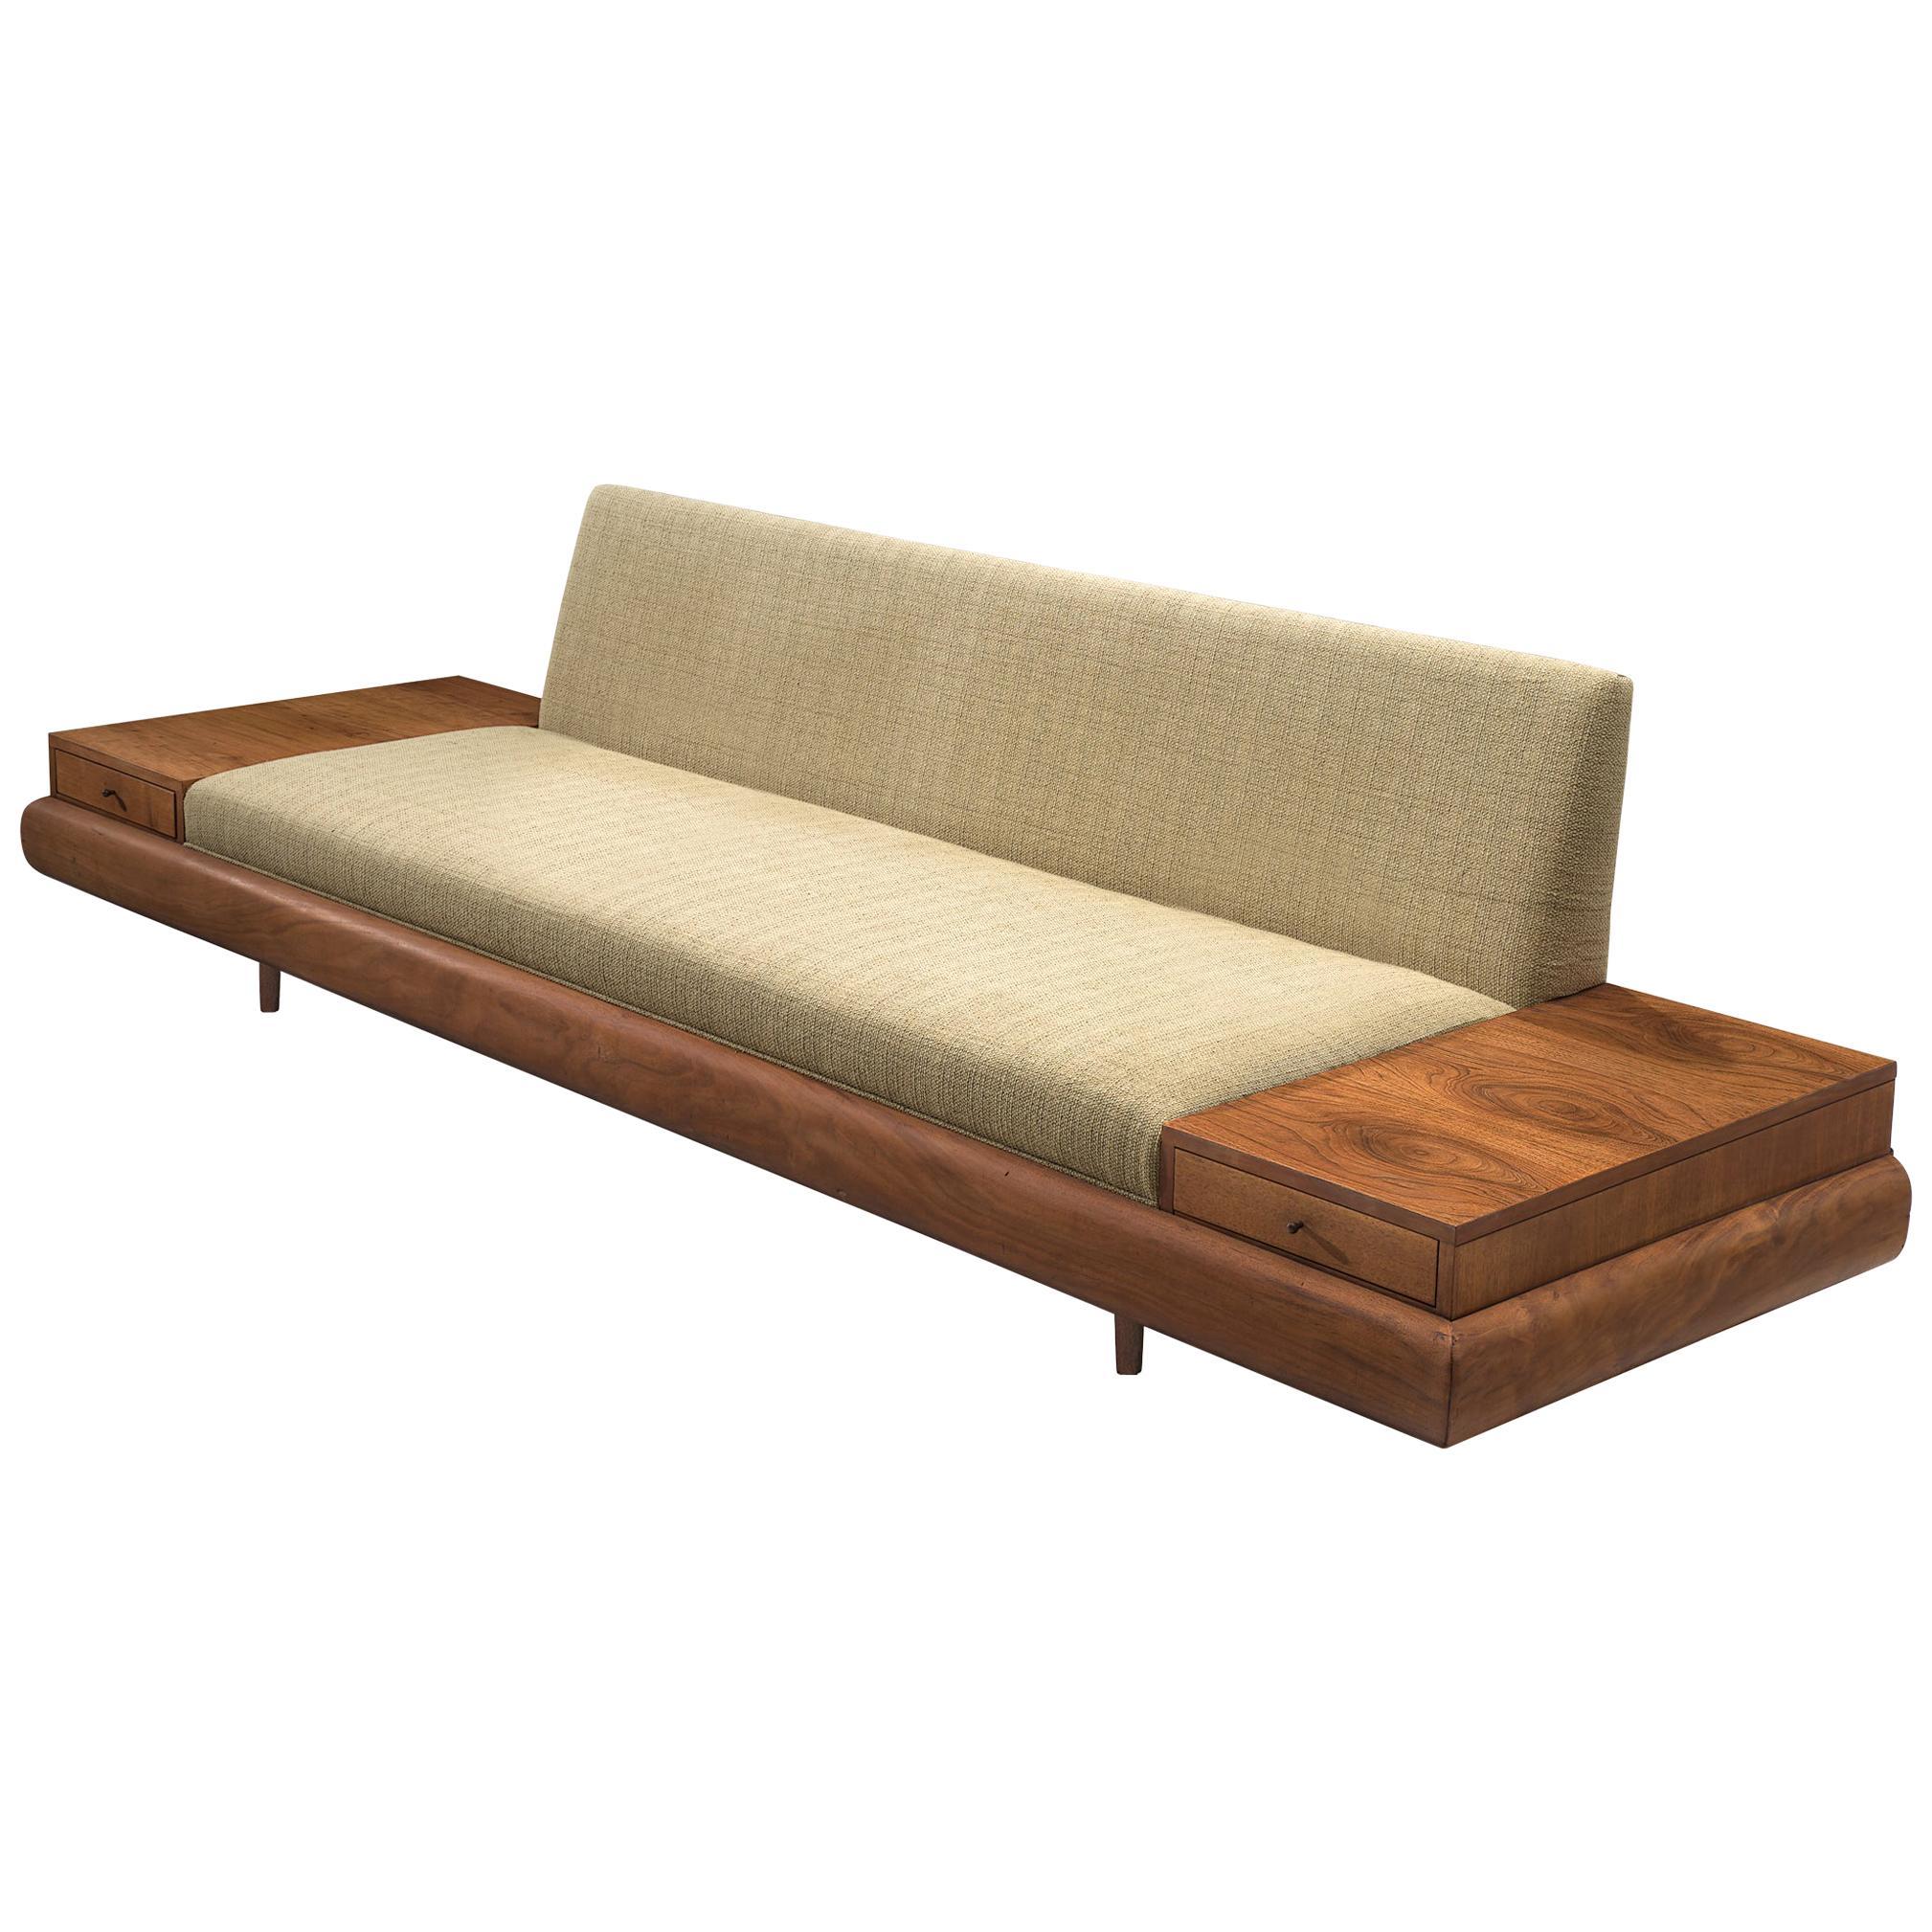 Strange Adrian Pearsall Customizable 1709 S Platform Sofa Andrewgaddart Wooden Chair Designs For Living Room Andrewgaddartcom